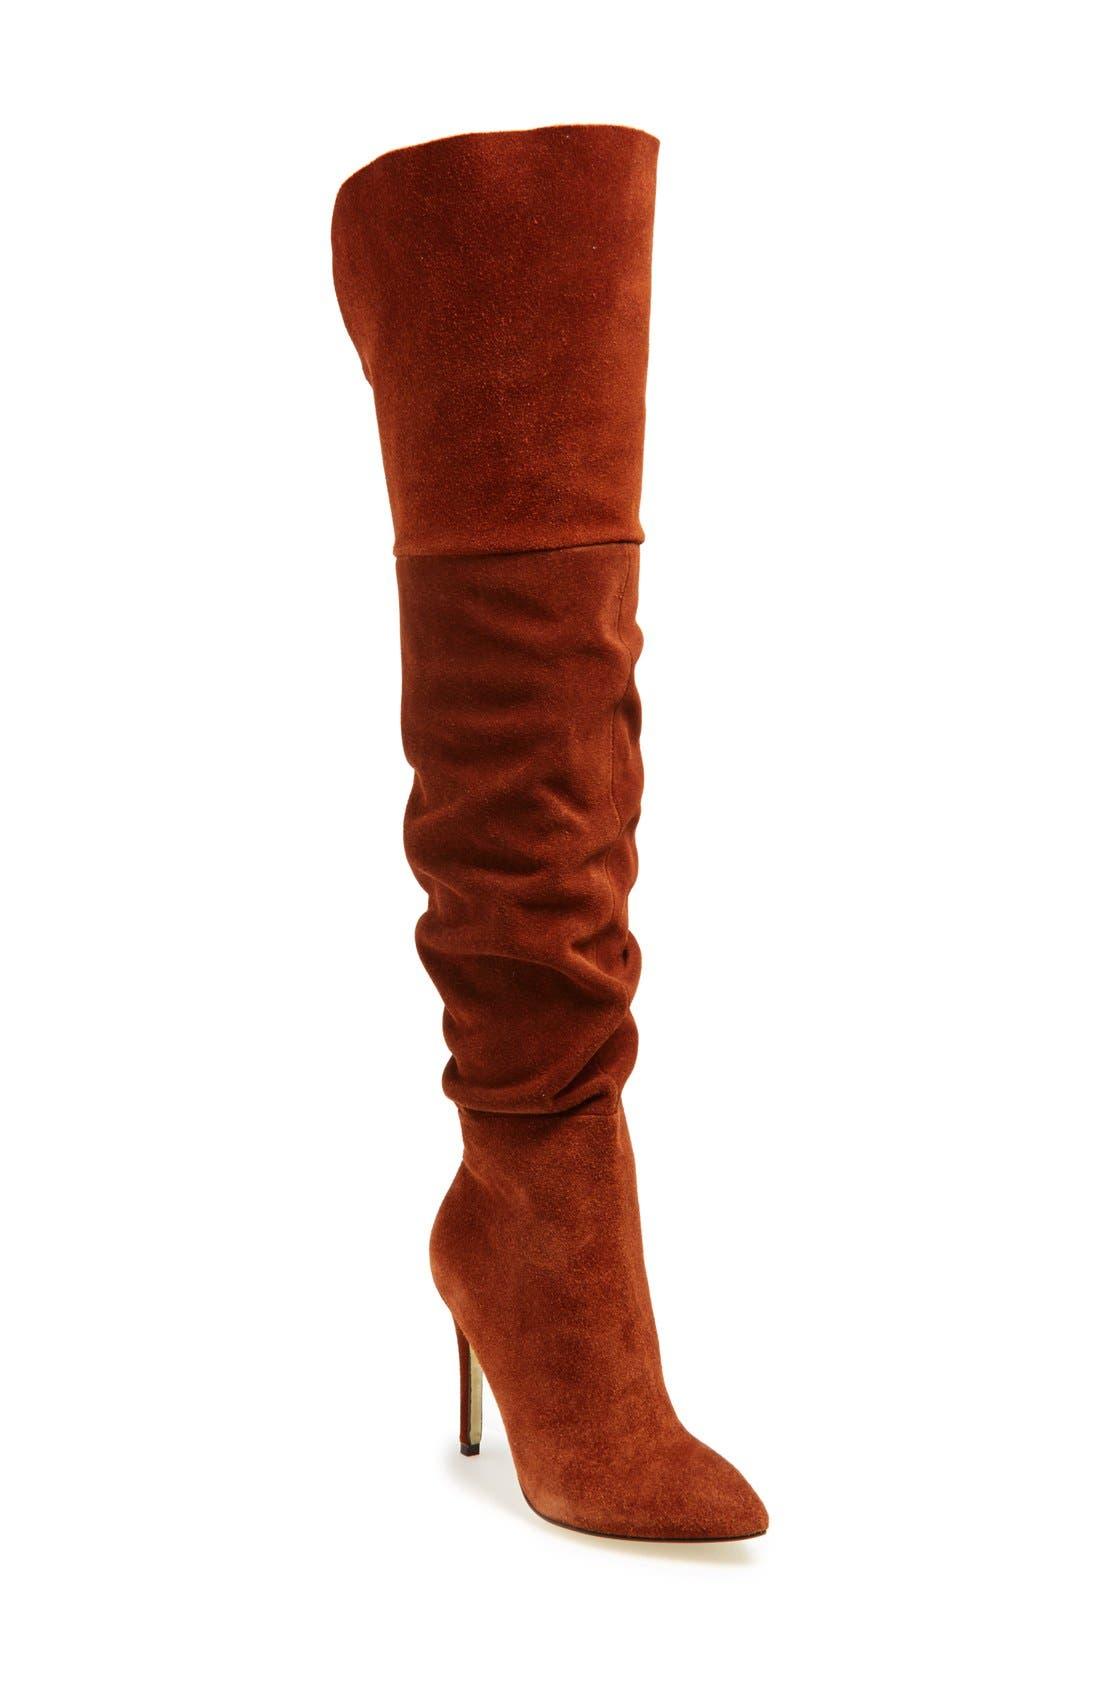 Main Image - Kristin Cavallari 'Calissa' Over the Knee Slouch Boot (Women)